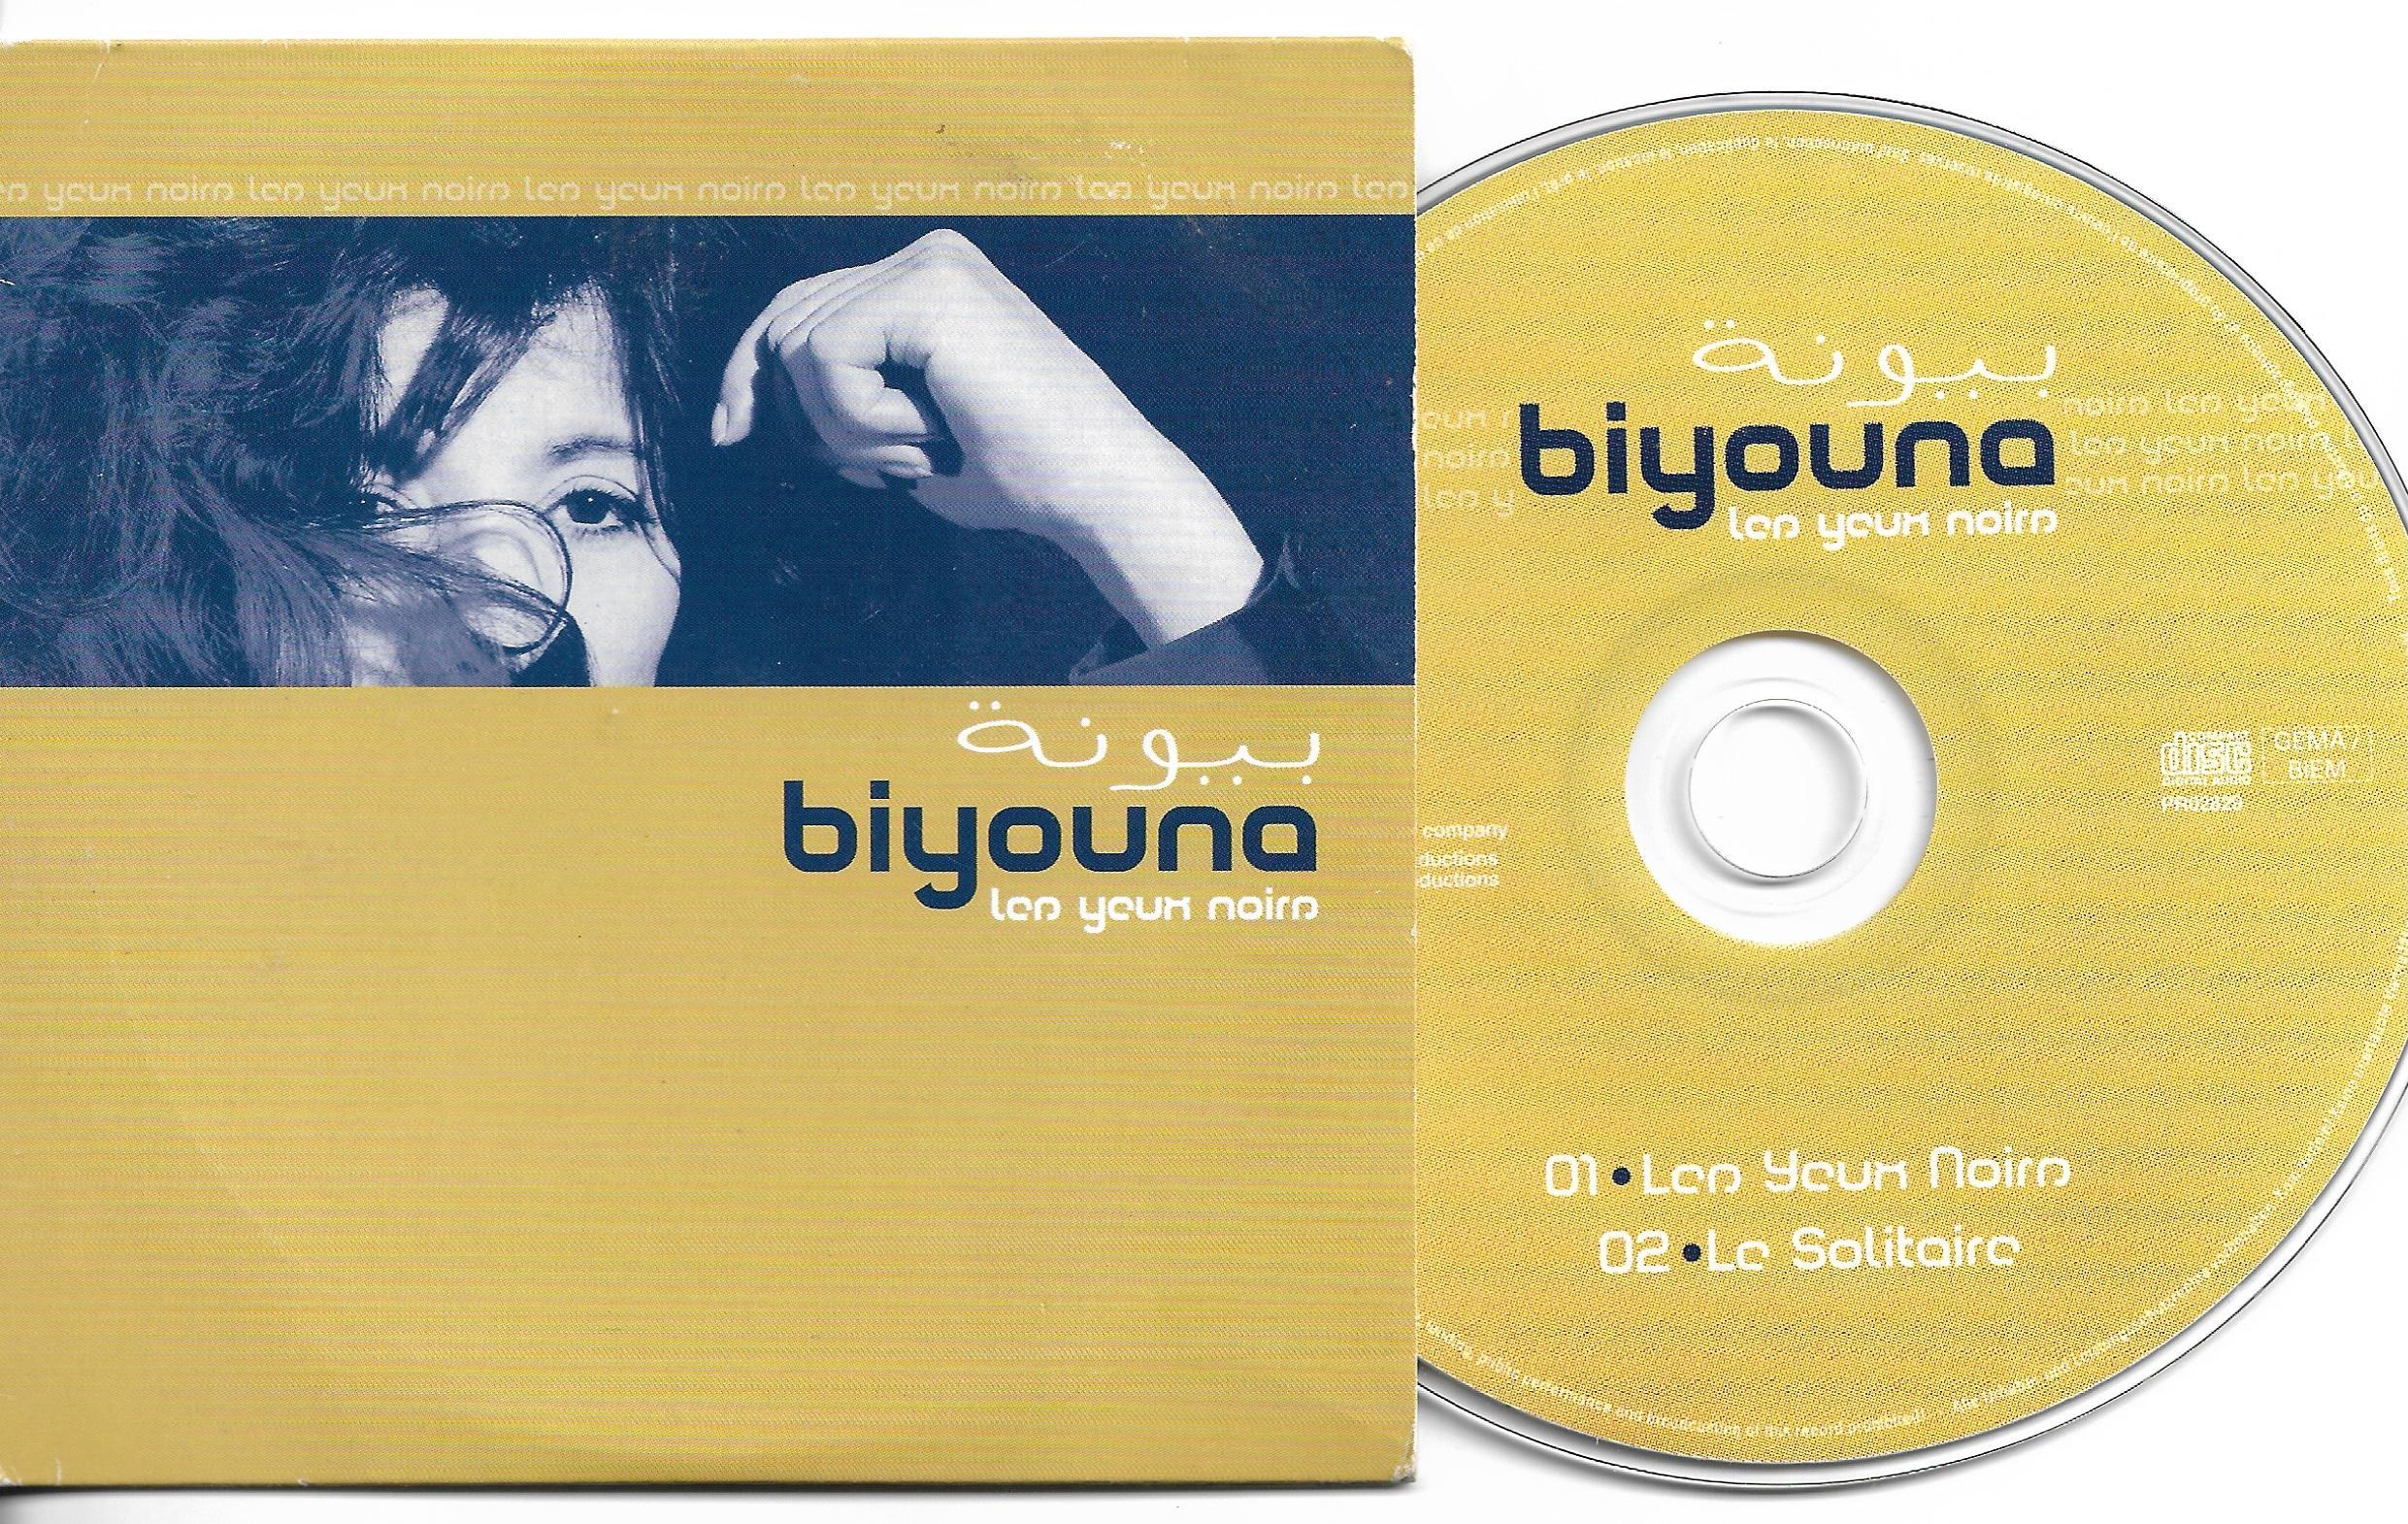 BIYOUNA - Tes yeux Noirs Promo 2 track Card Sleeve - CD single